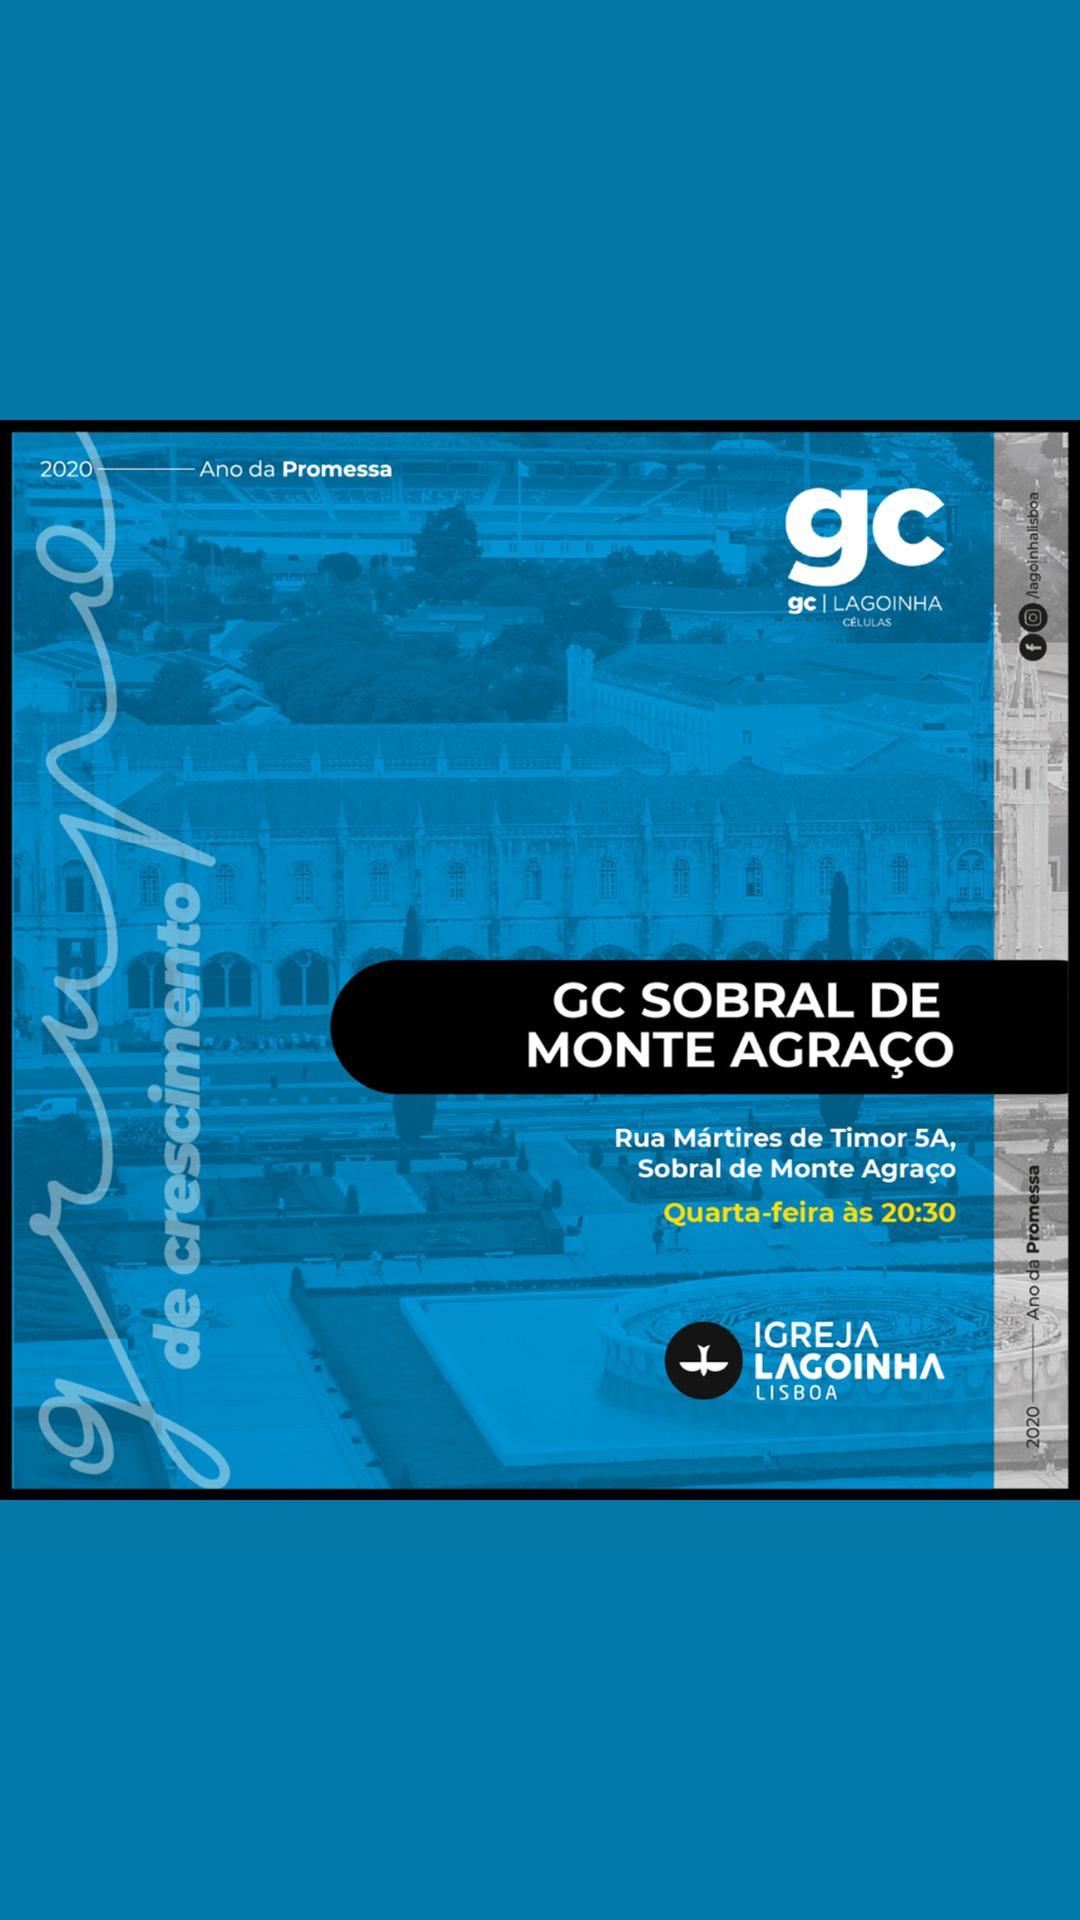 GC_Sobral_Monte_Agraco